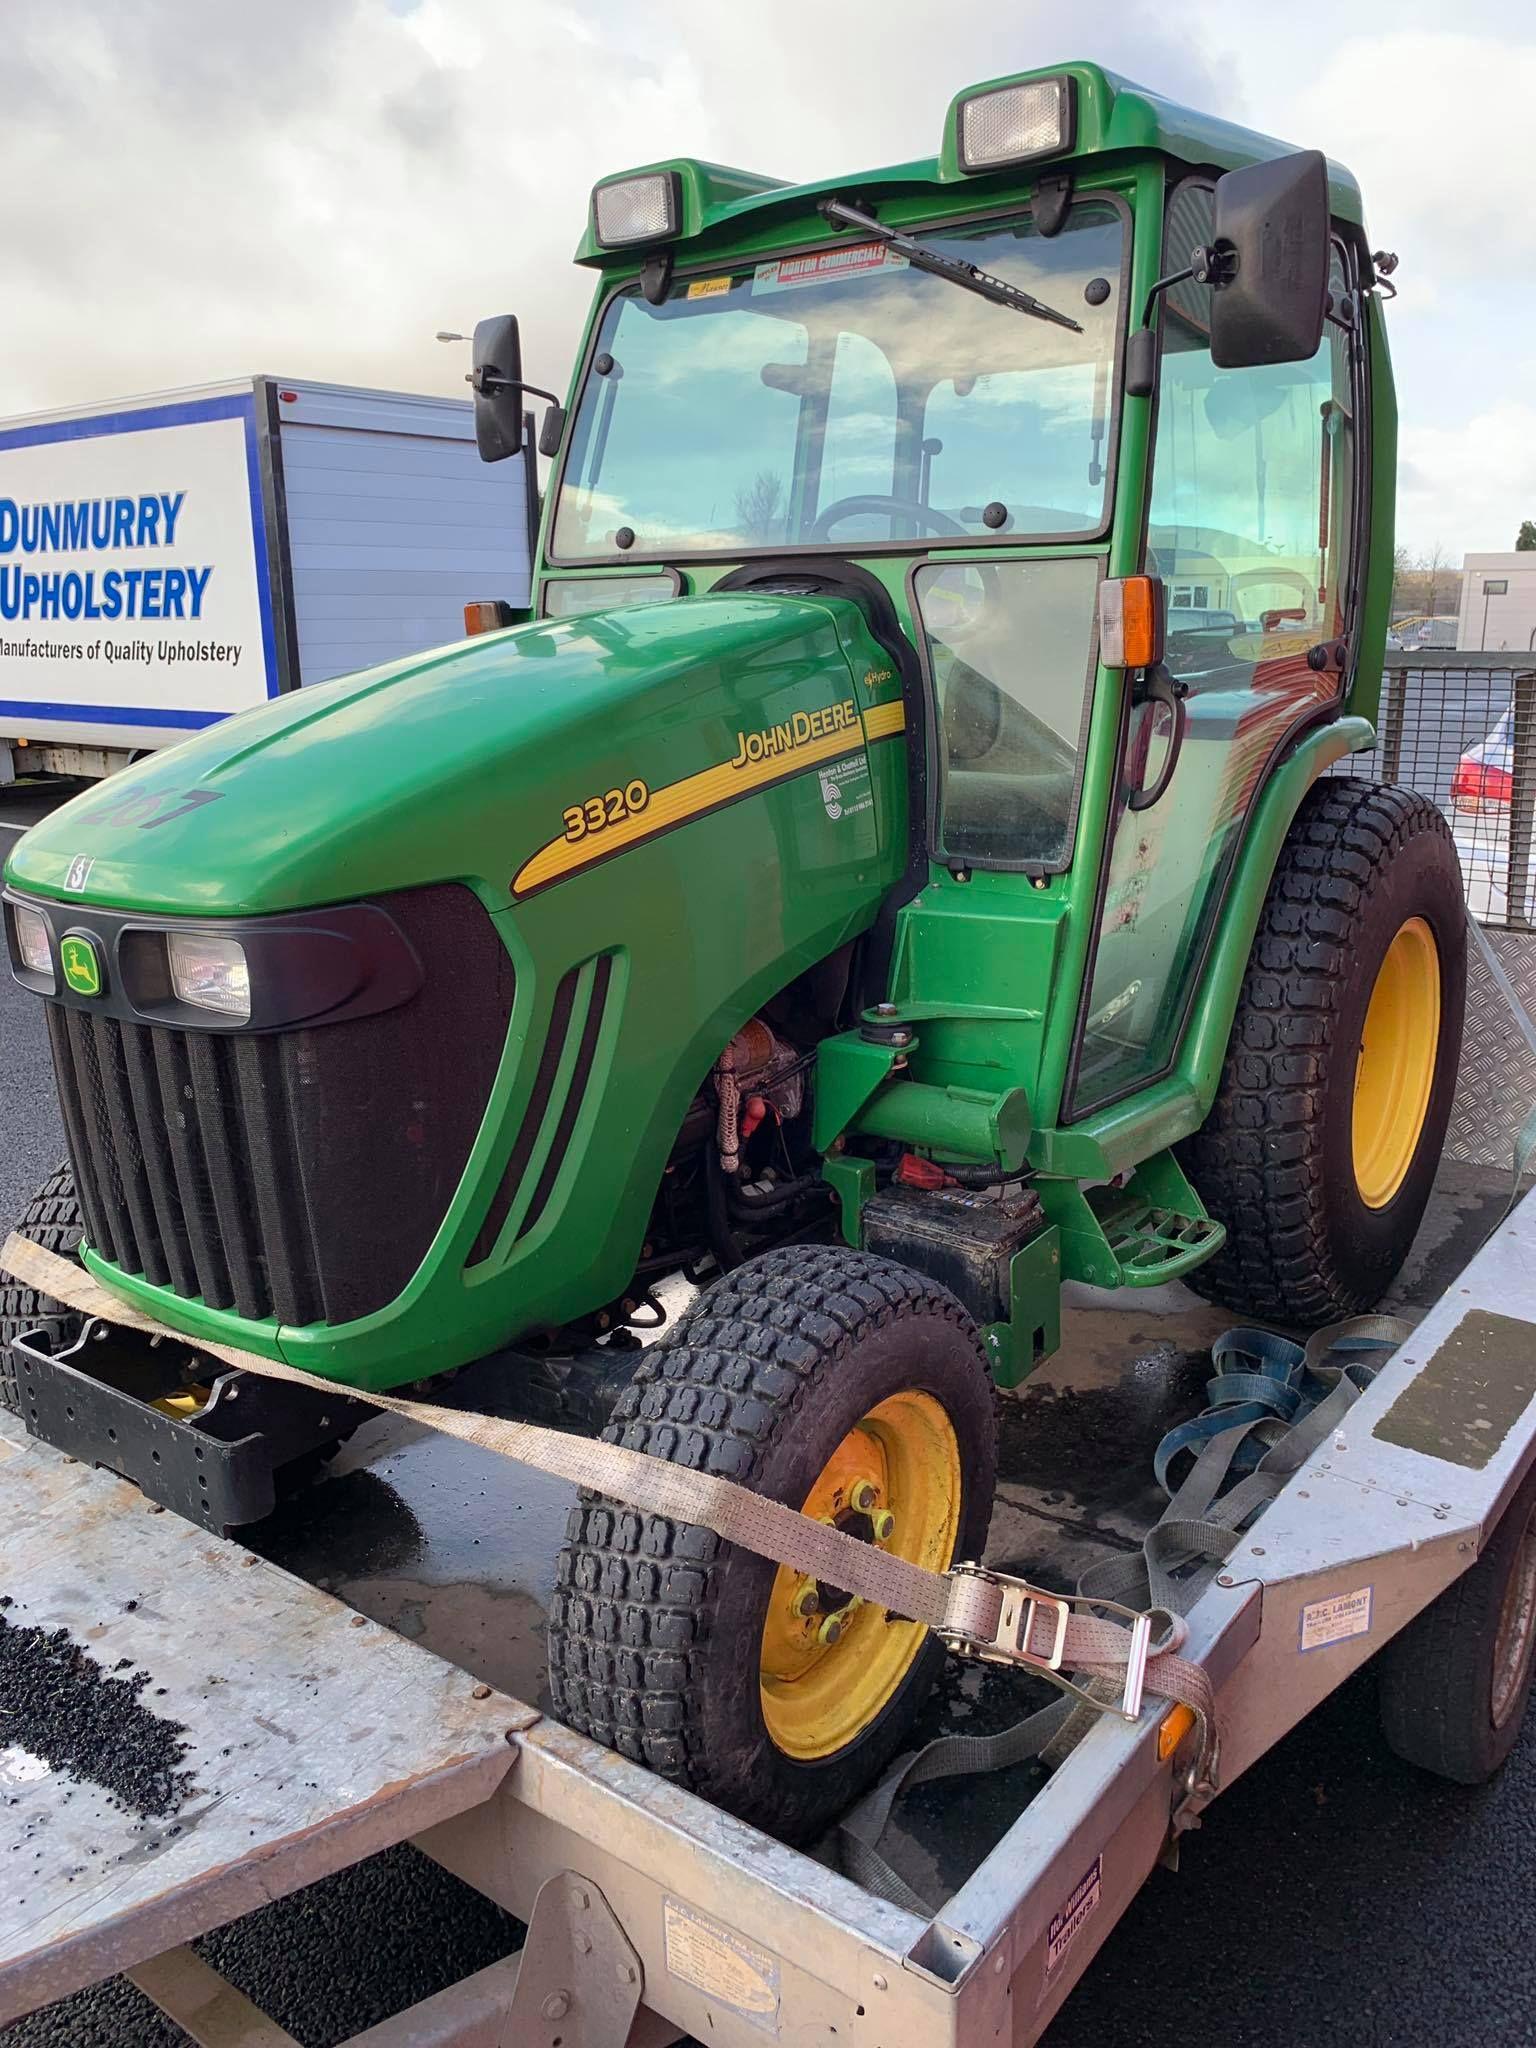 John Deere tractor 3320 before installing radio